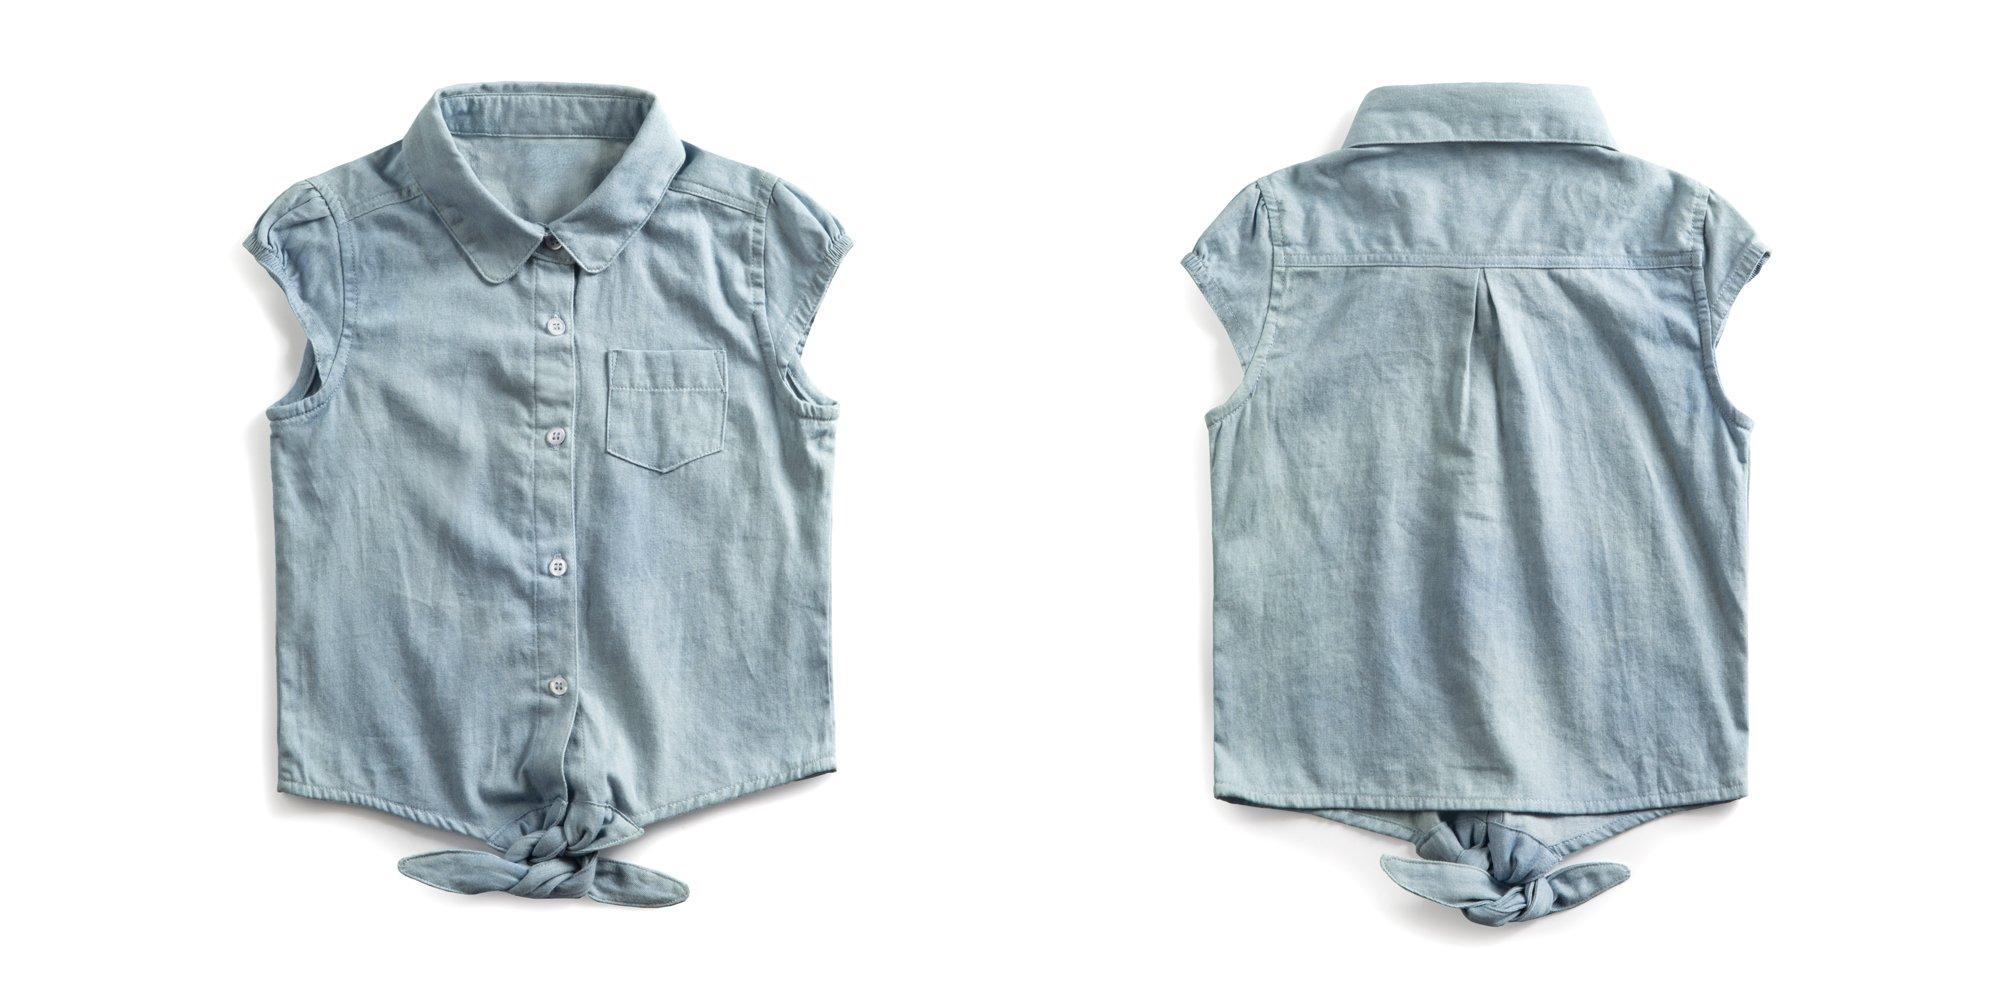 Firengato Girl's Cotton Casual Denim Button-up Shirt,2-8 Years (2 Years) by Firengato (Image #3)